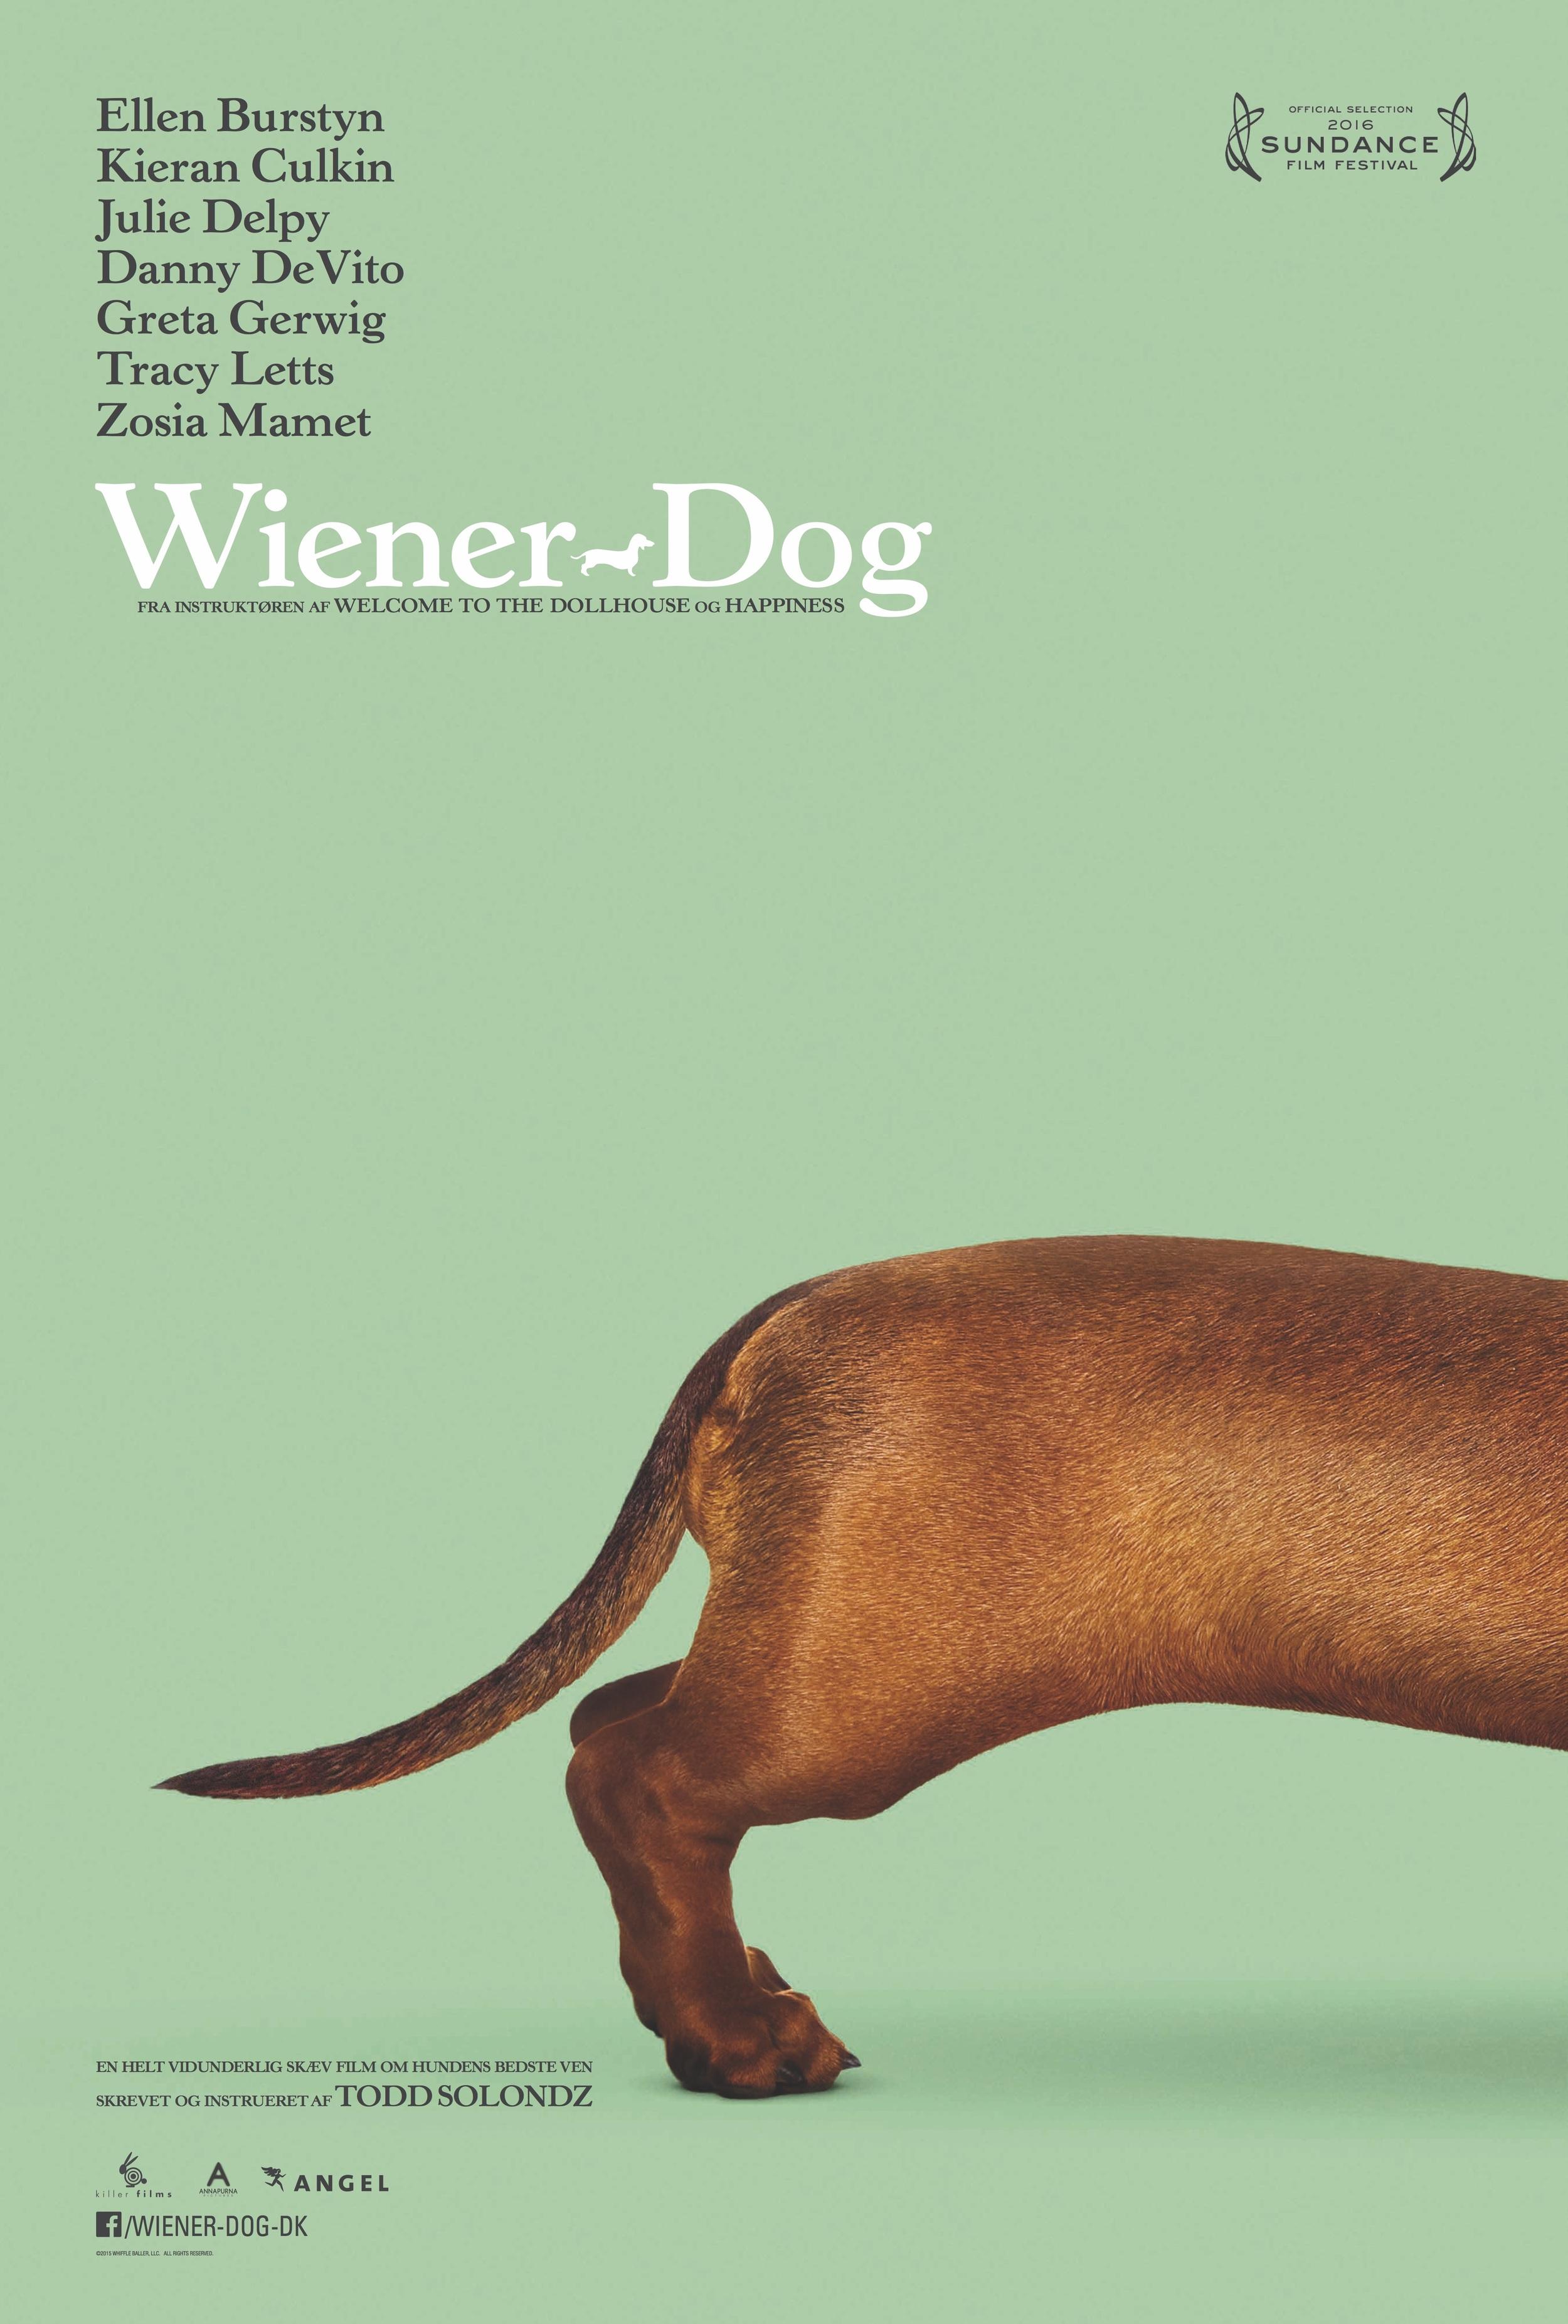 poster_wiener-dog.jpg